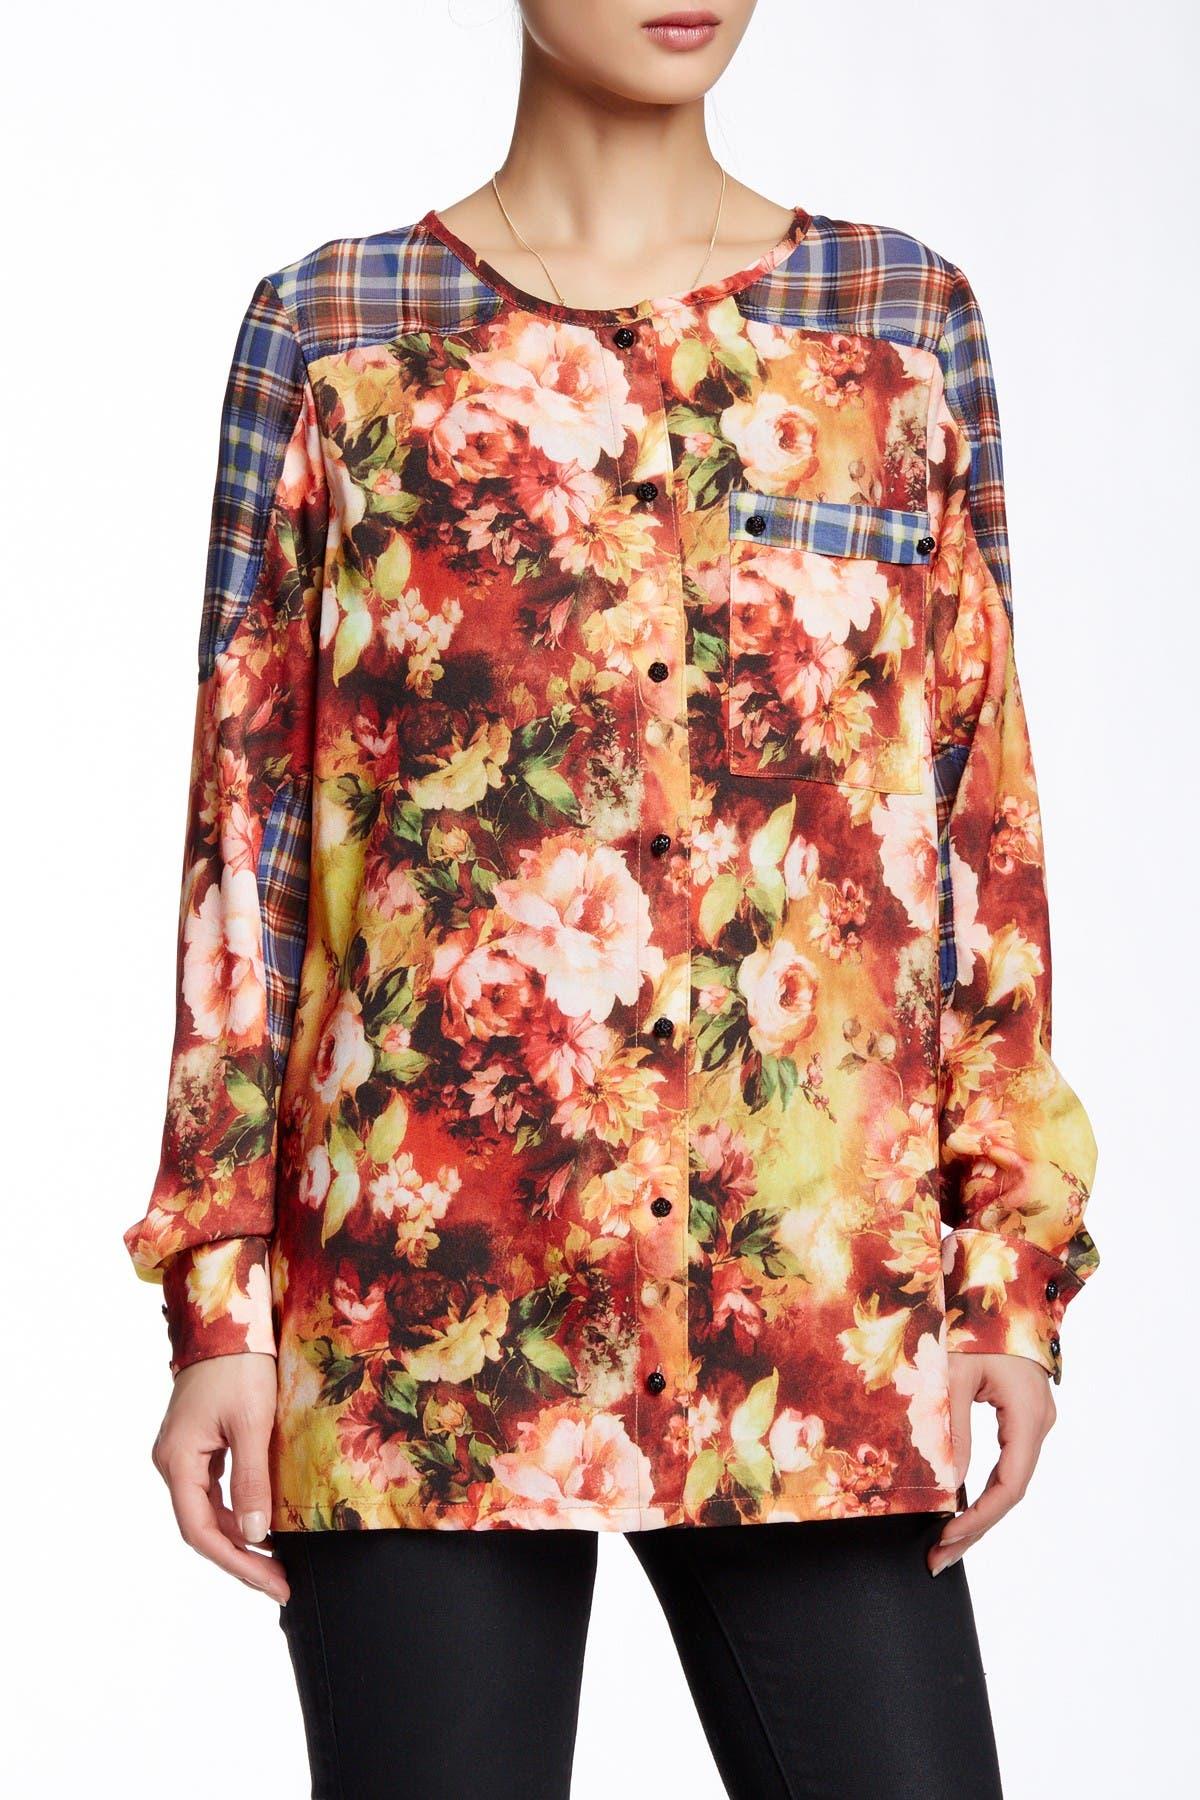 Image of TOV Plaid Floral Print Tunic